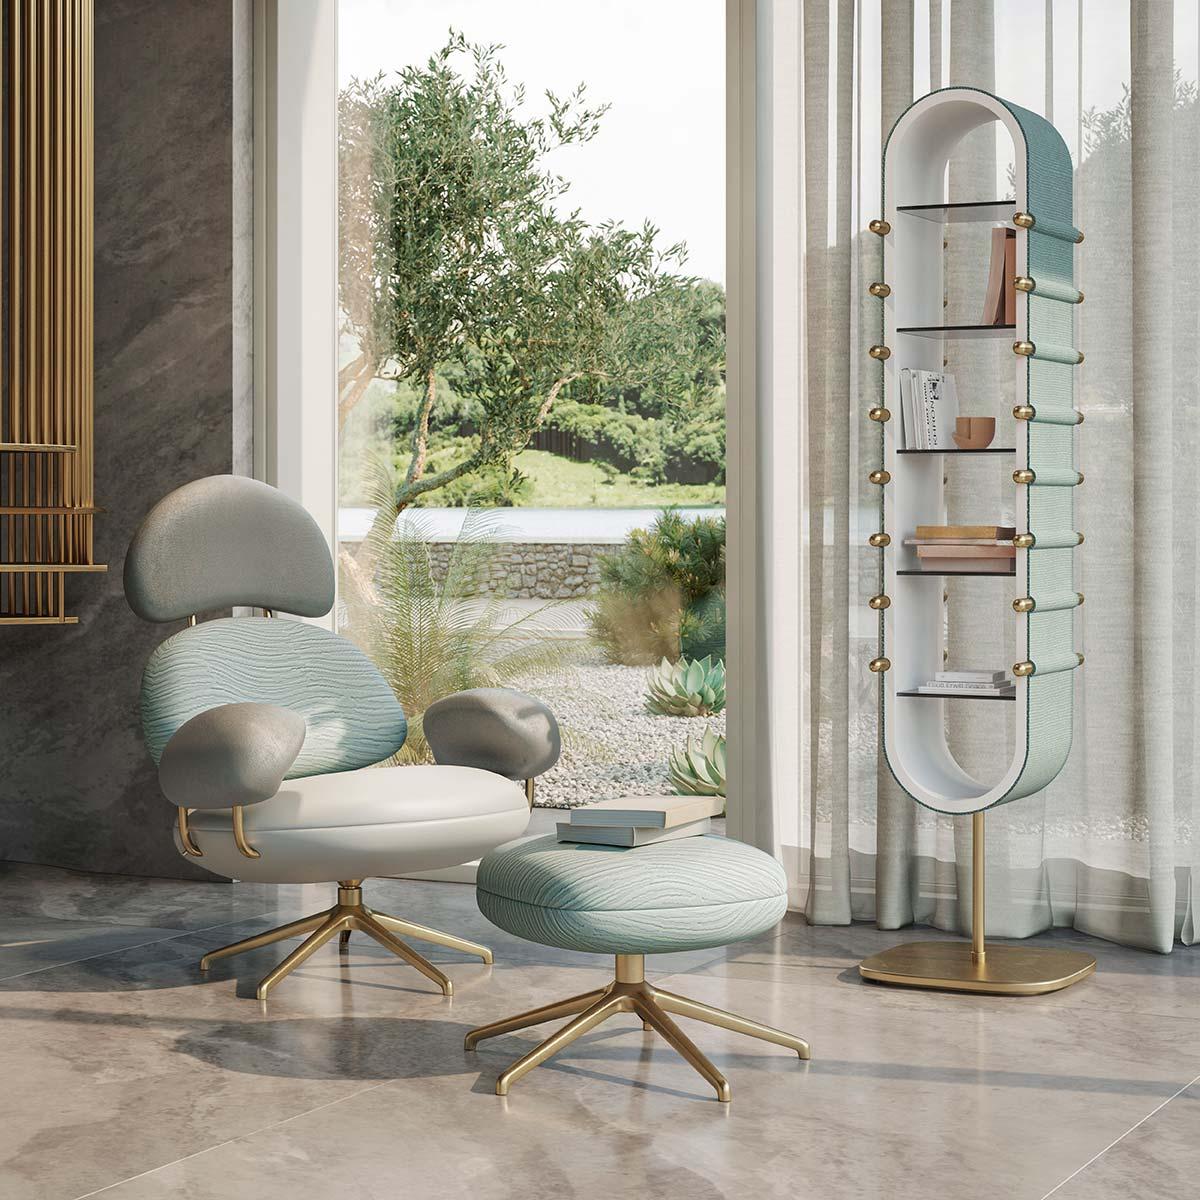 Posidonia collection by Natuzzi, Design by Elena Salmistraro